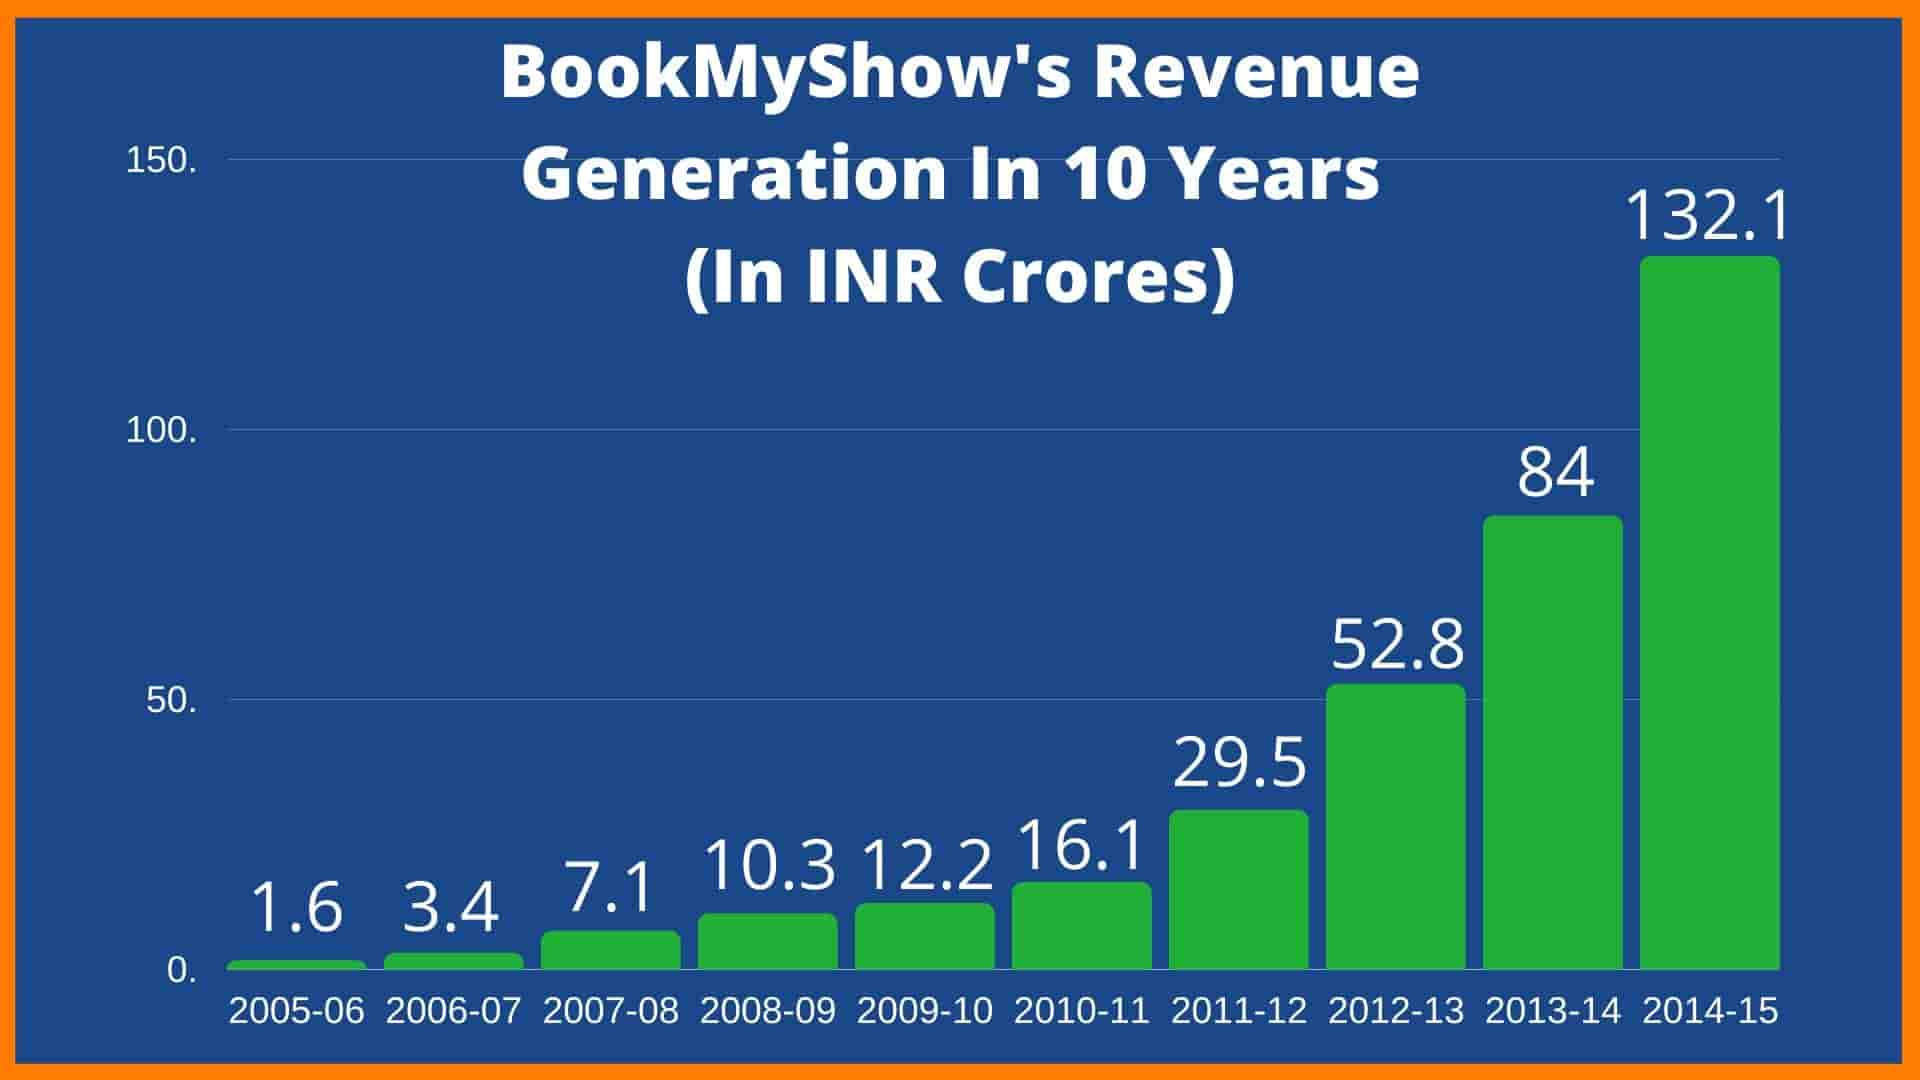 BookMyShow Revenue Generation